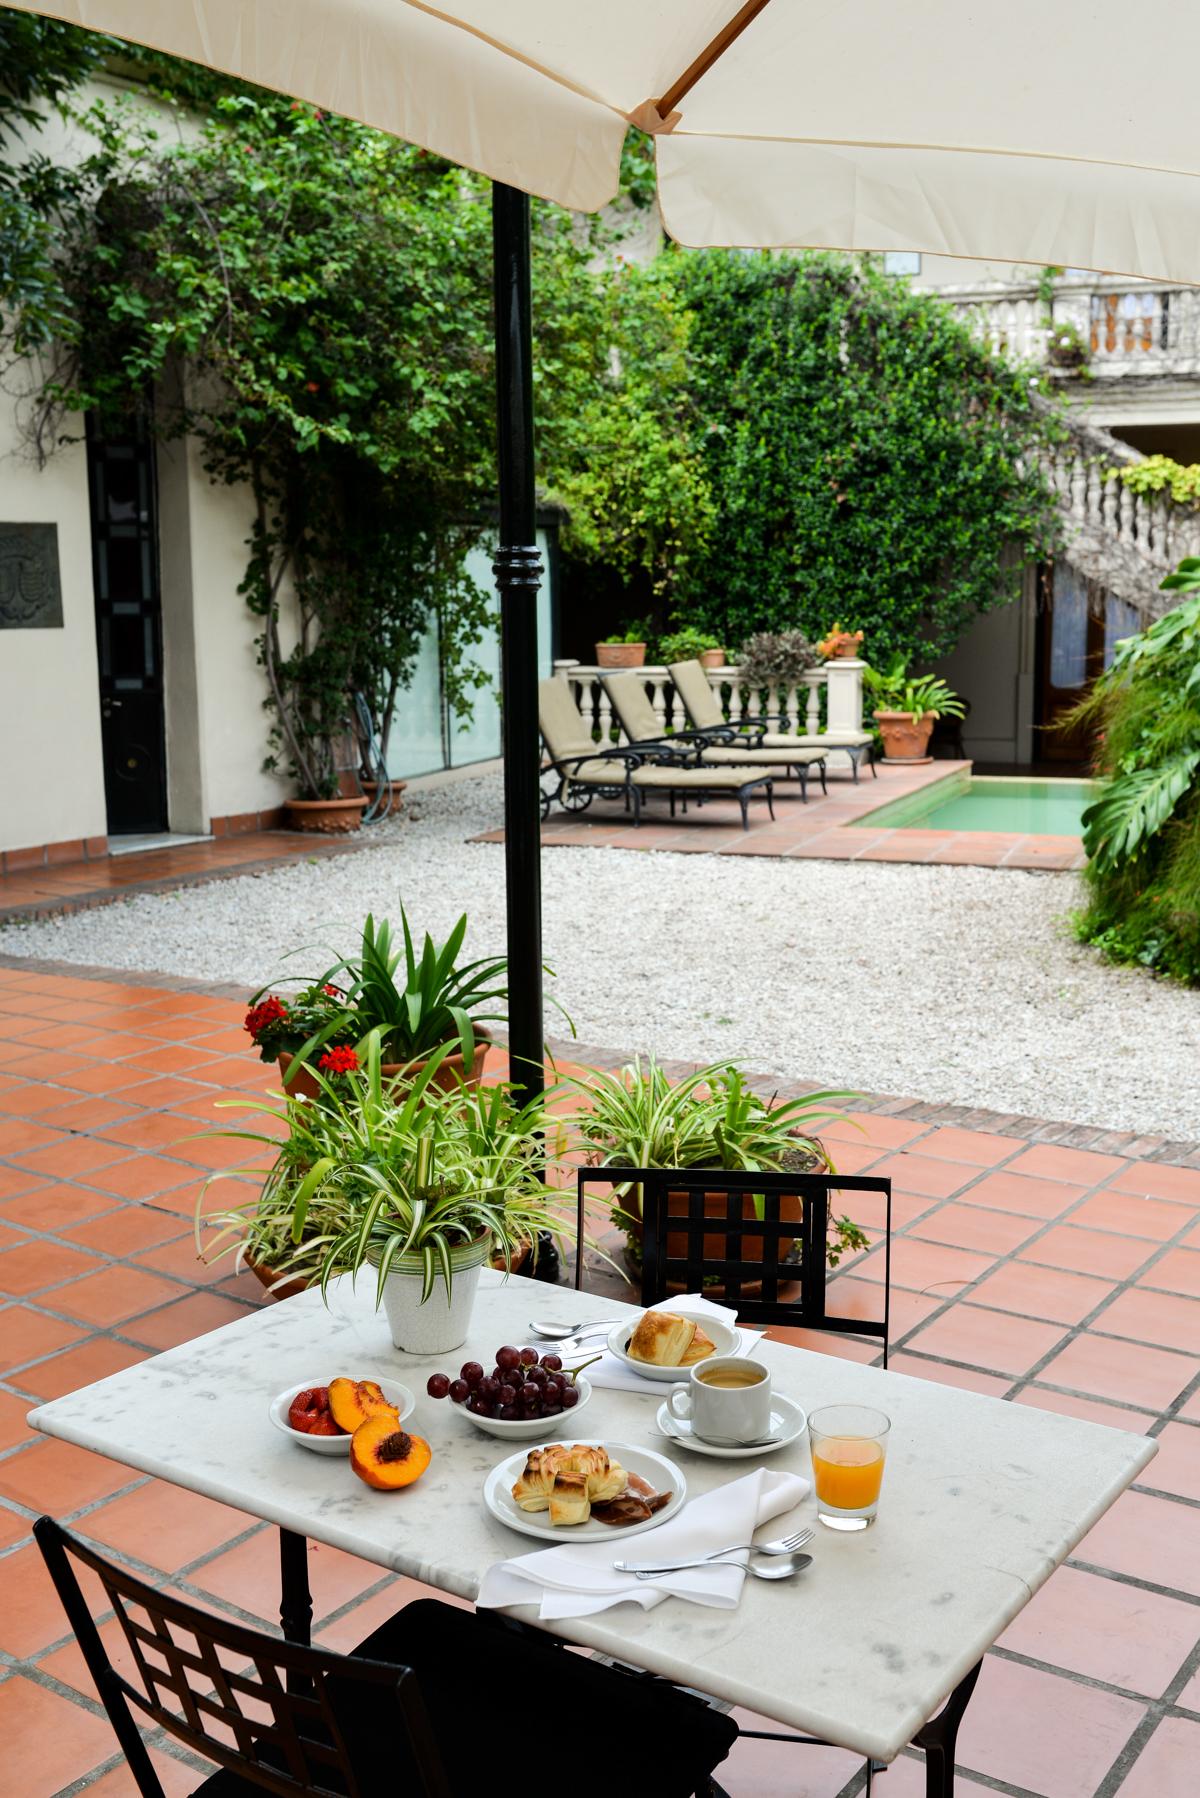 Stacie-Flinner-San-Isidro-Hotel-Del-Casco-4